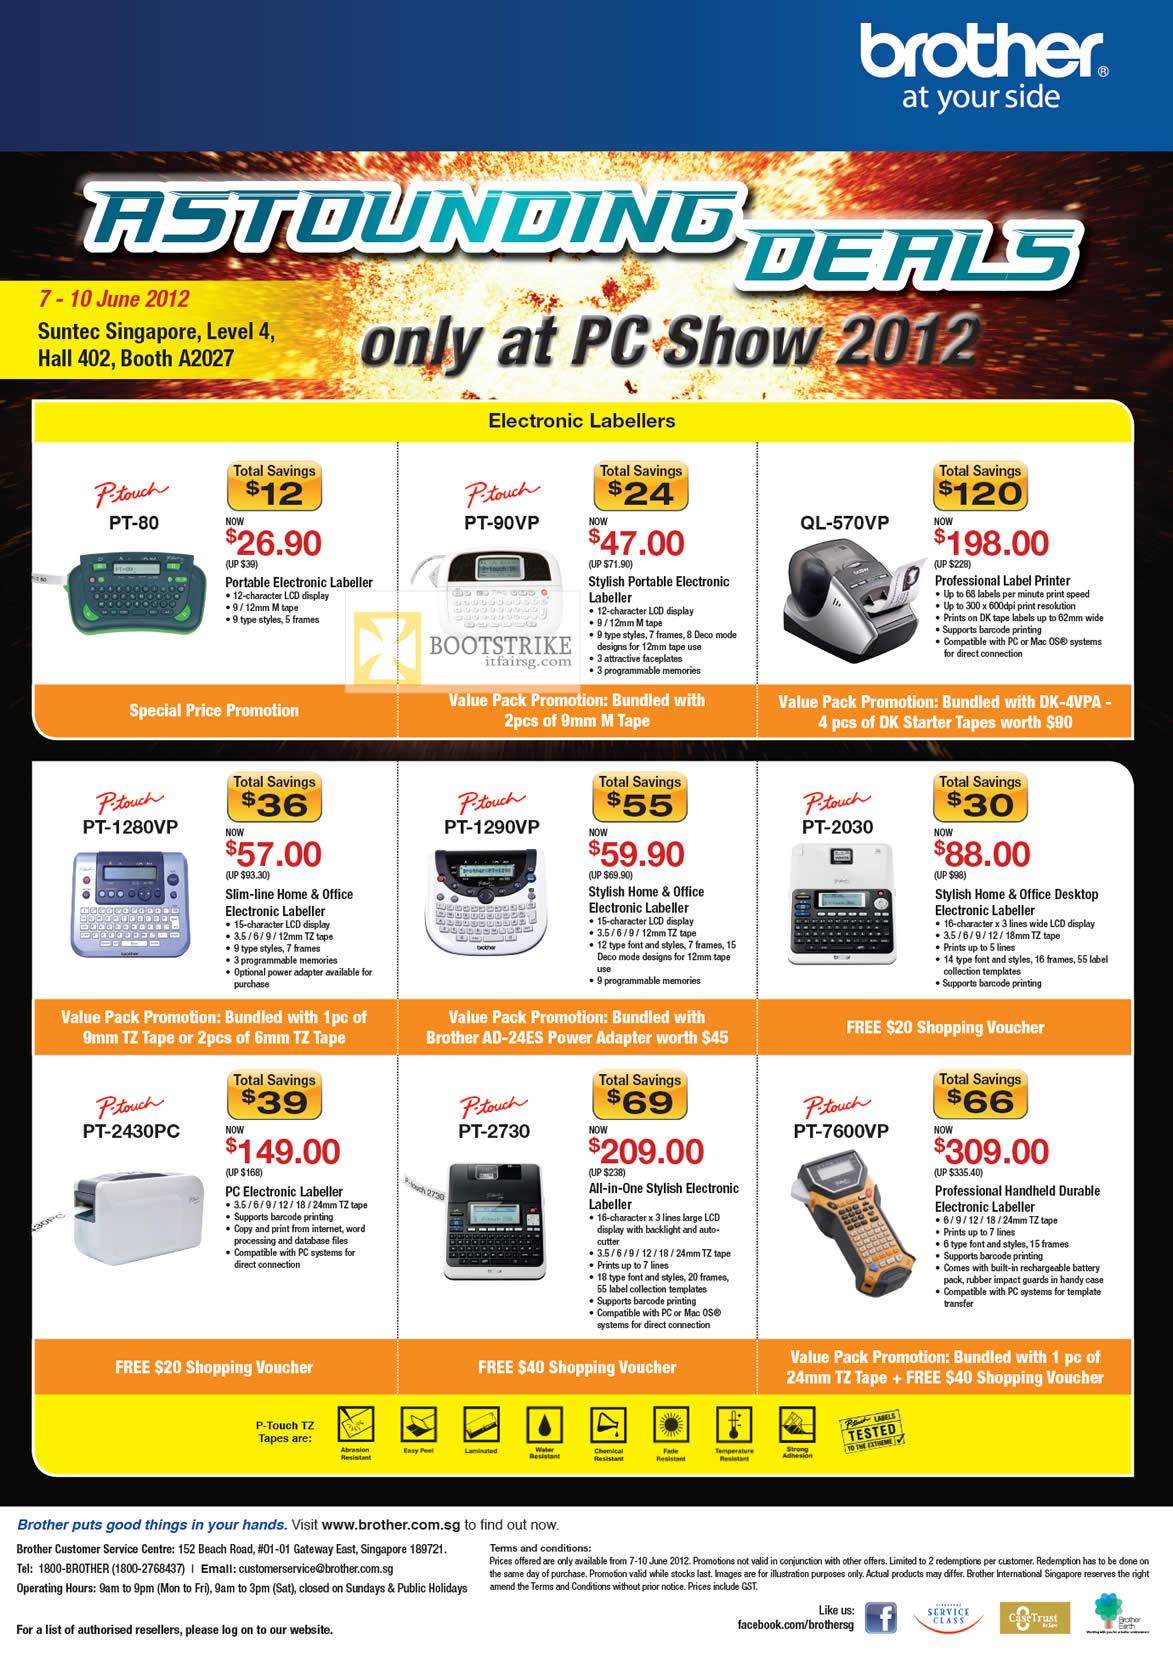 PC SHOW 2012 price list image brochure of Brother Labellers P-Touch PT-80, PT-90VP, QL-570VP, PT-2030, PT-1290VP, PT-1280VP, PT-7600VP, PT-2730, PT-2430PC